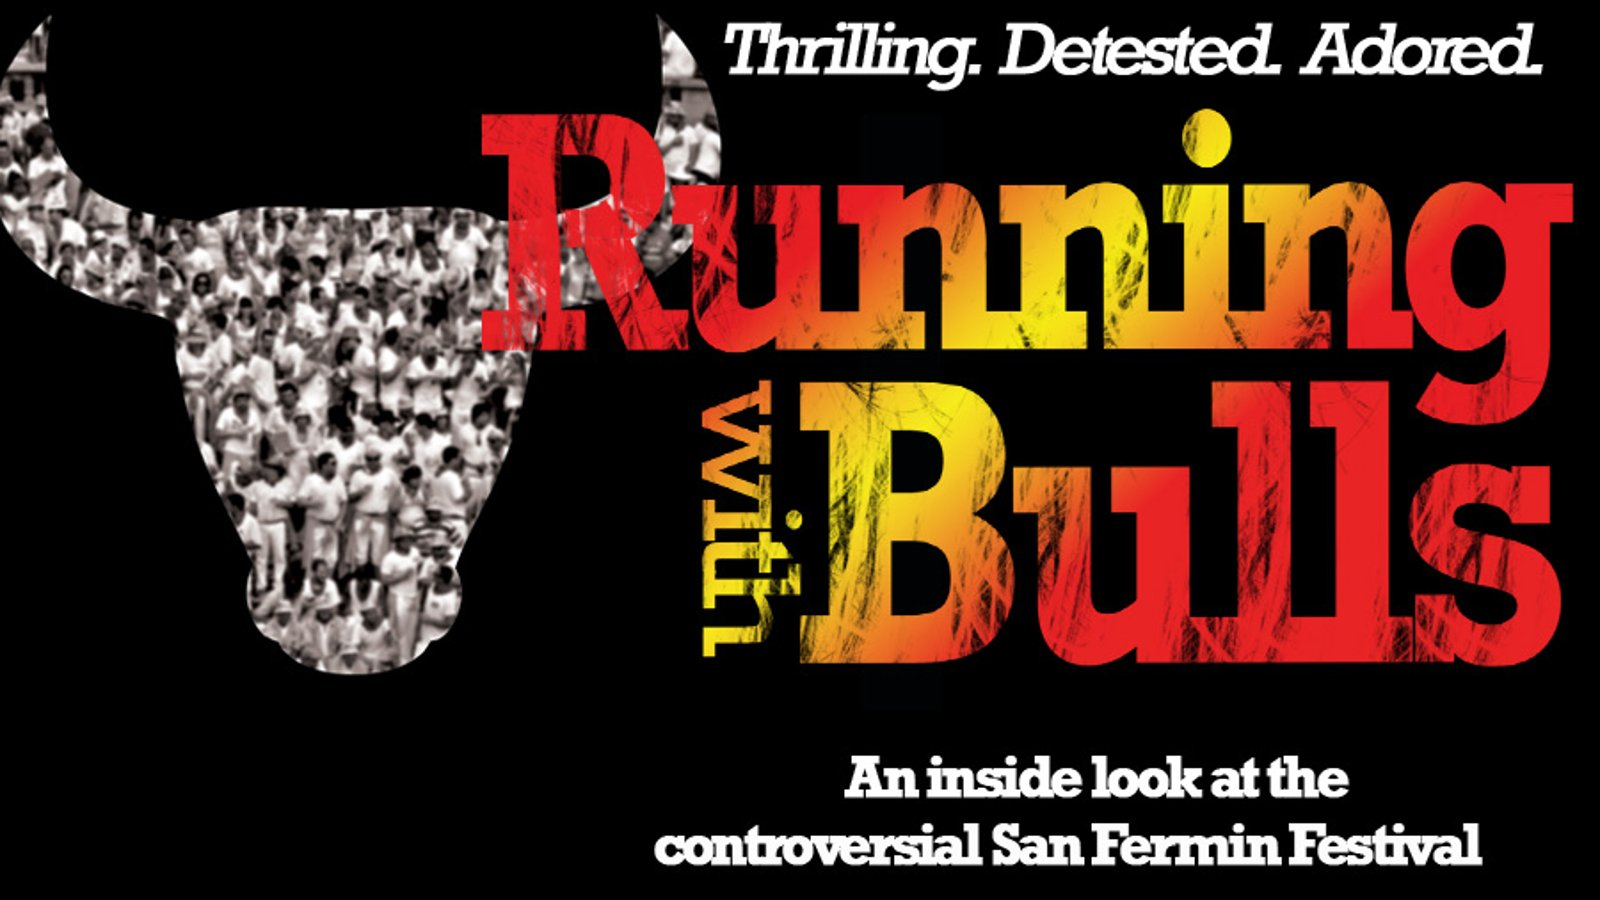 Running with Bulls - The Bull Run in Spain